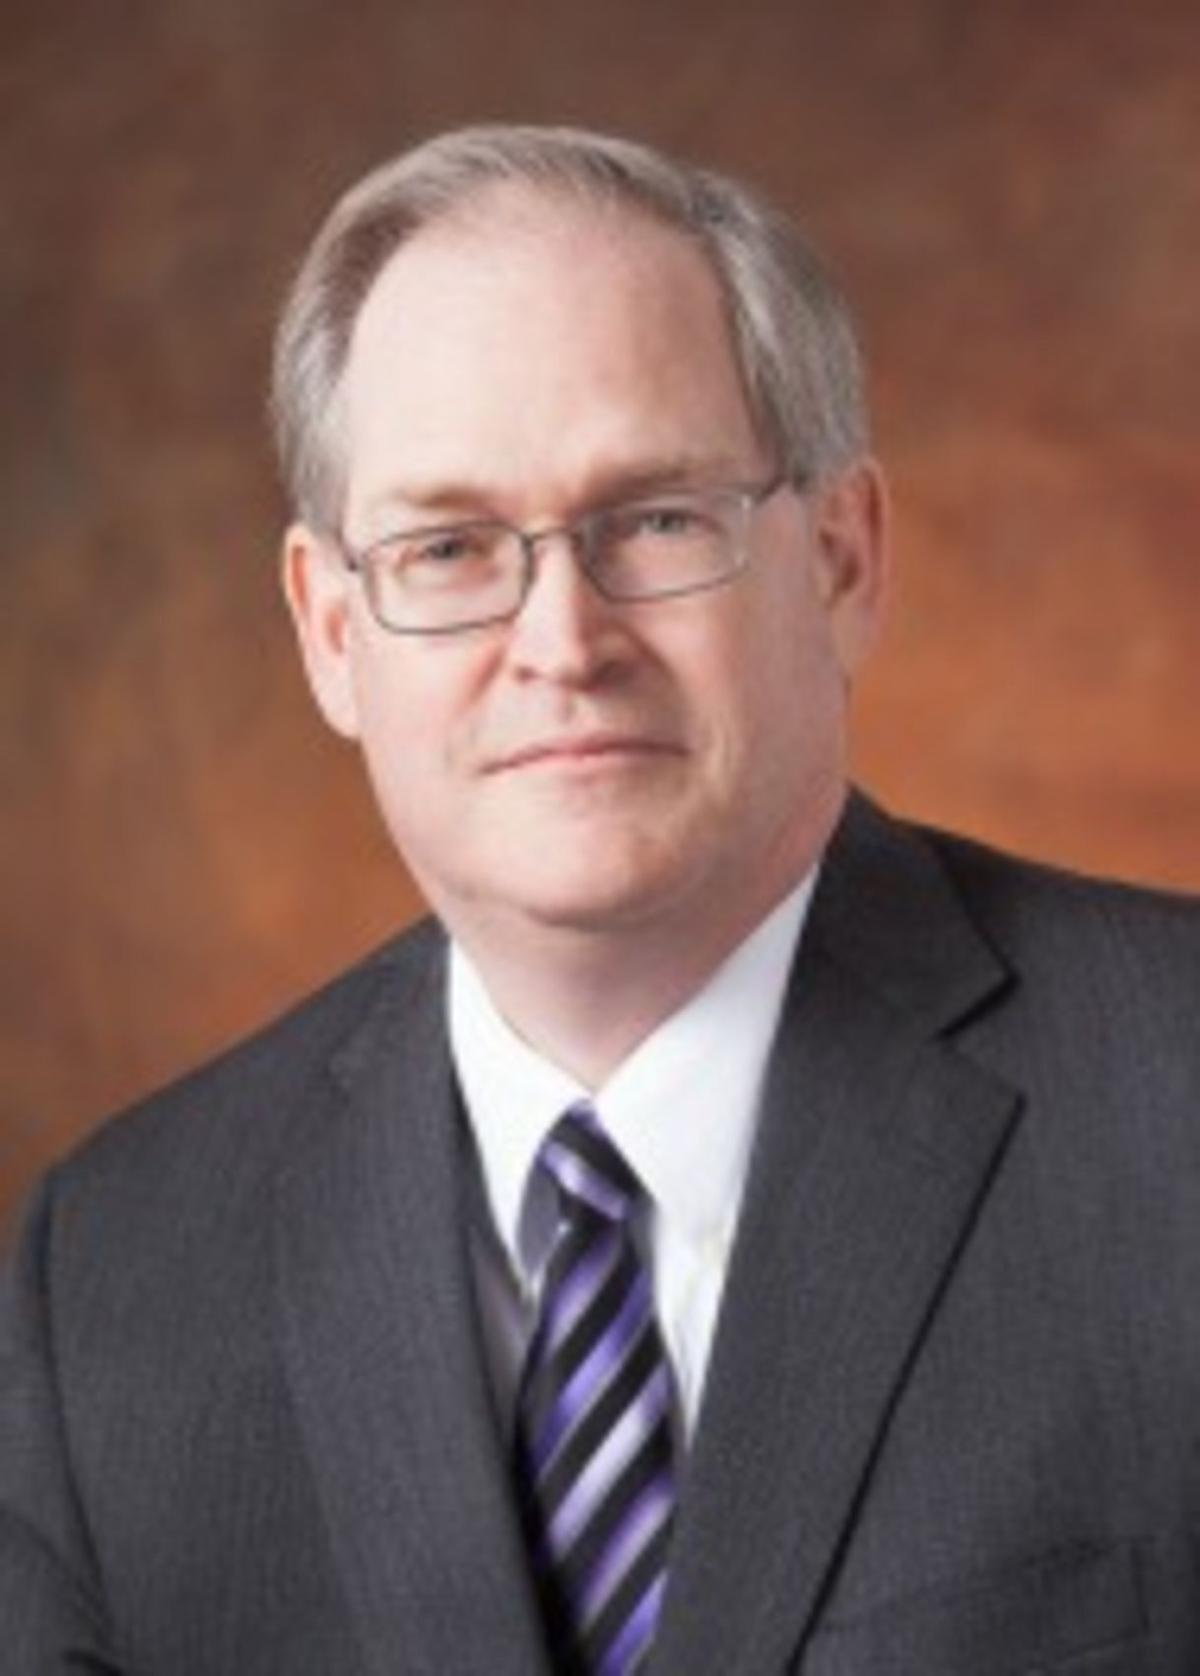 Brian Cartwright